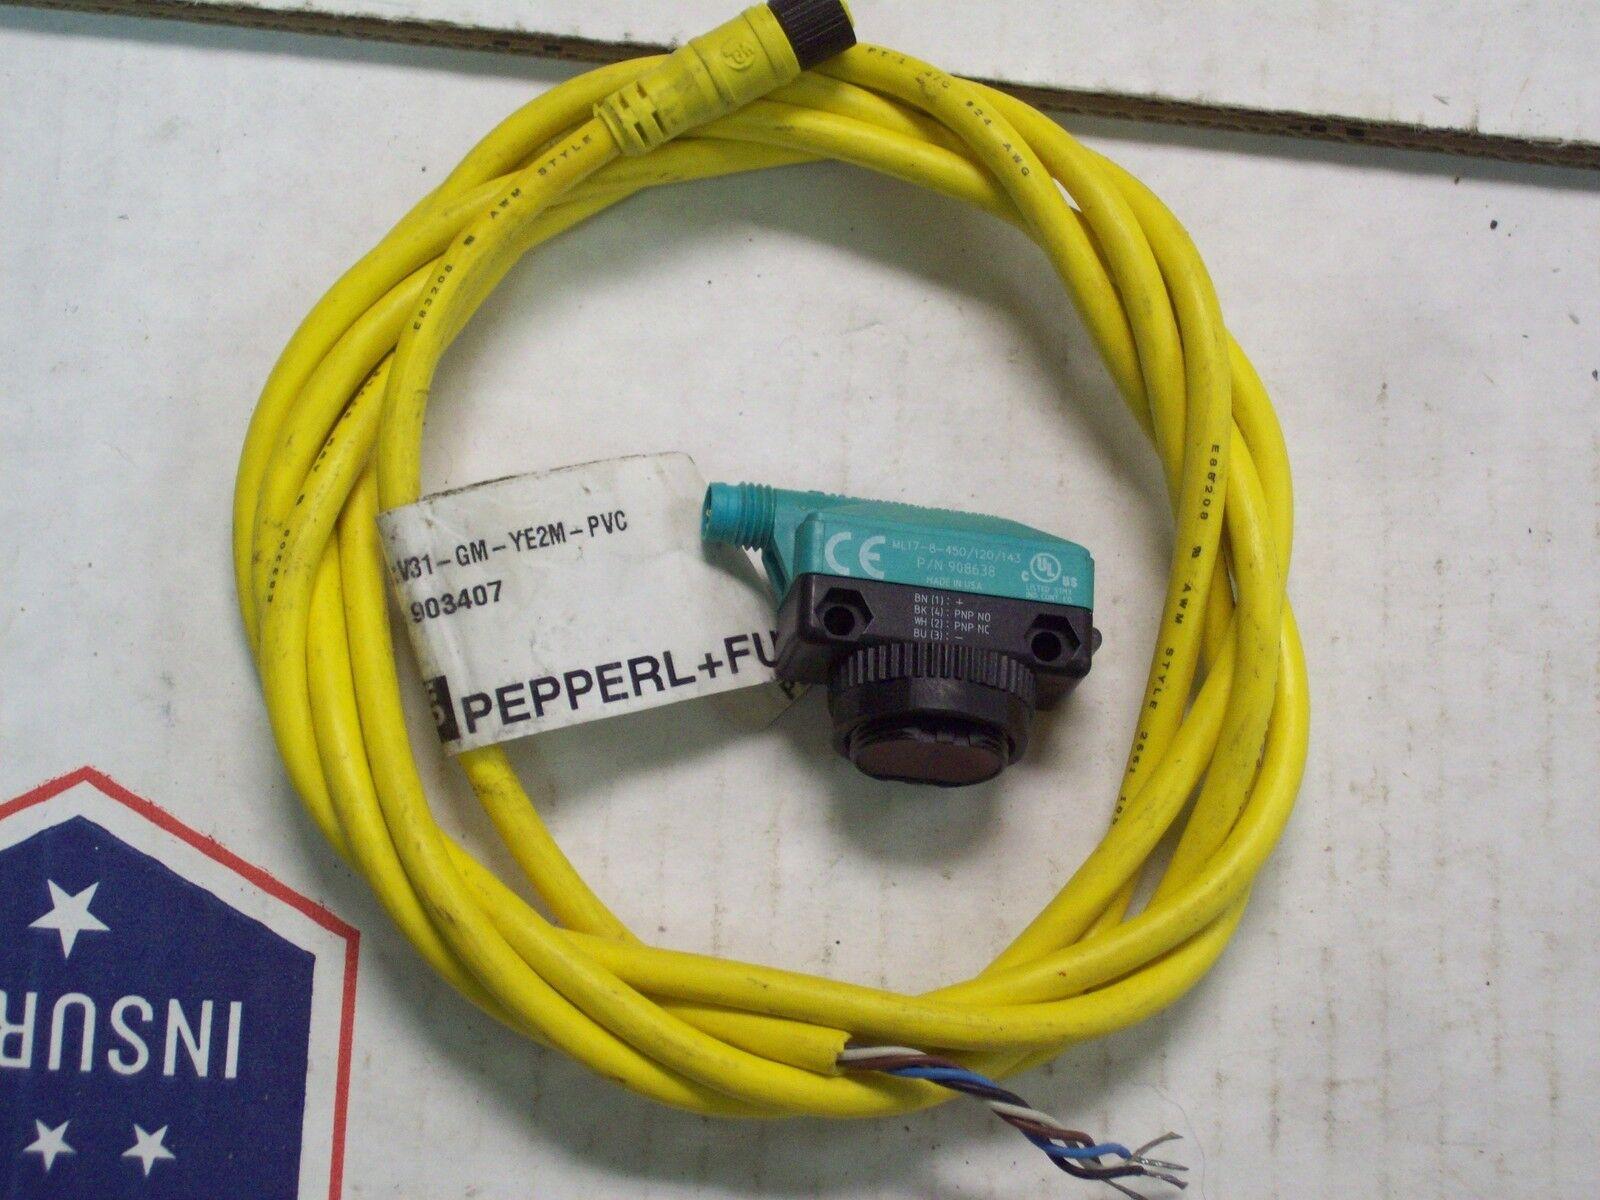 Pepperl    Fuchs Fotoeléctrica Sensor ML17-8-450/120/143 w Cable V31-GM-YE2M-PVC 0735b9